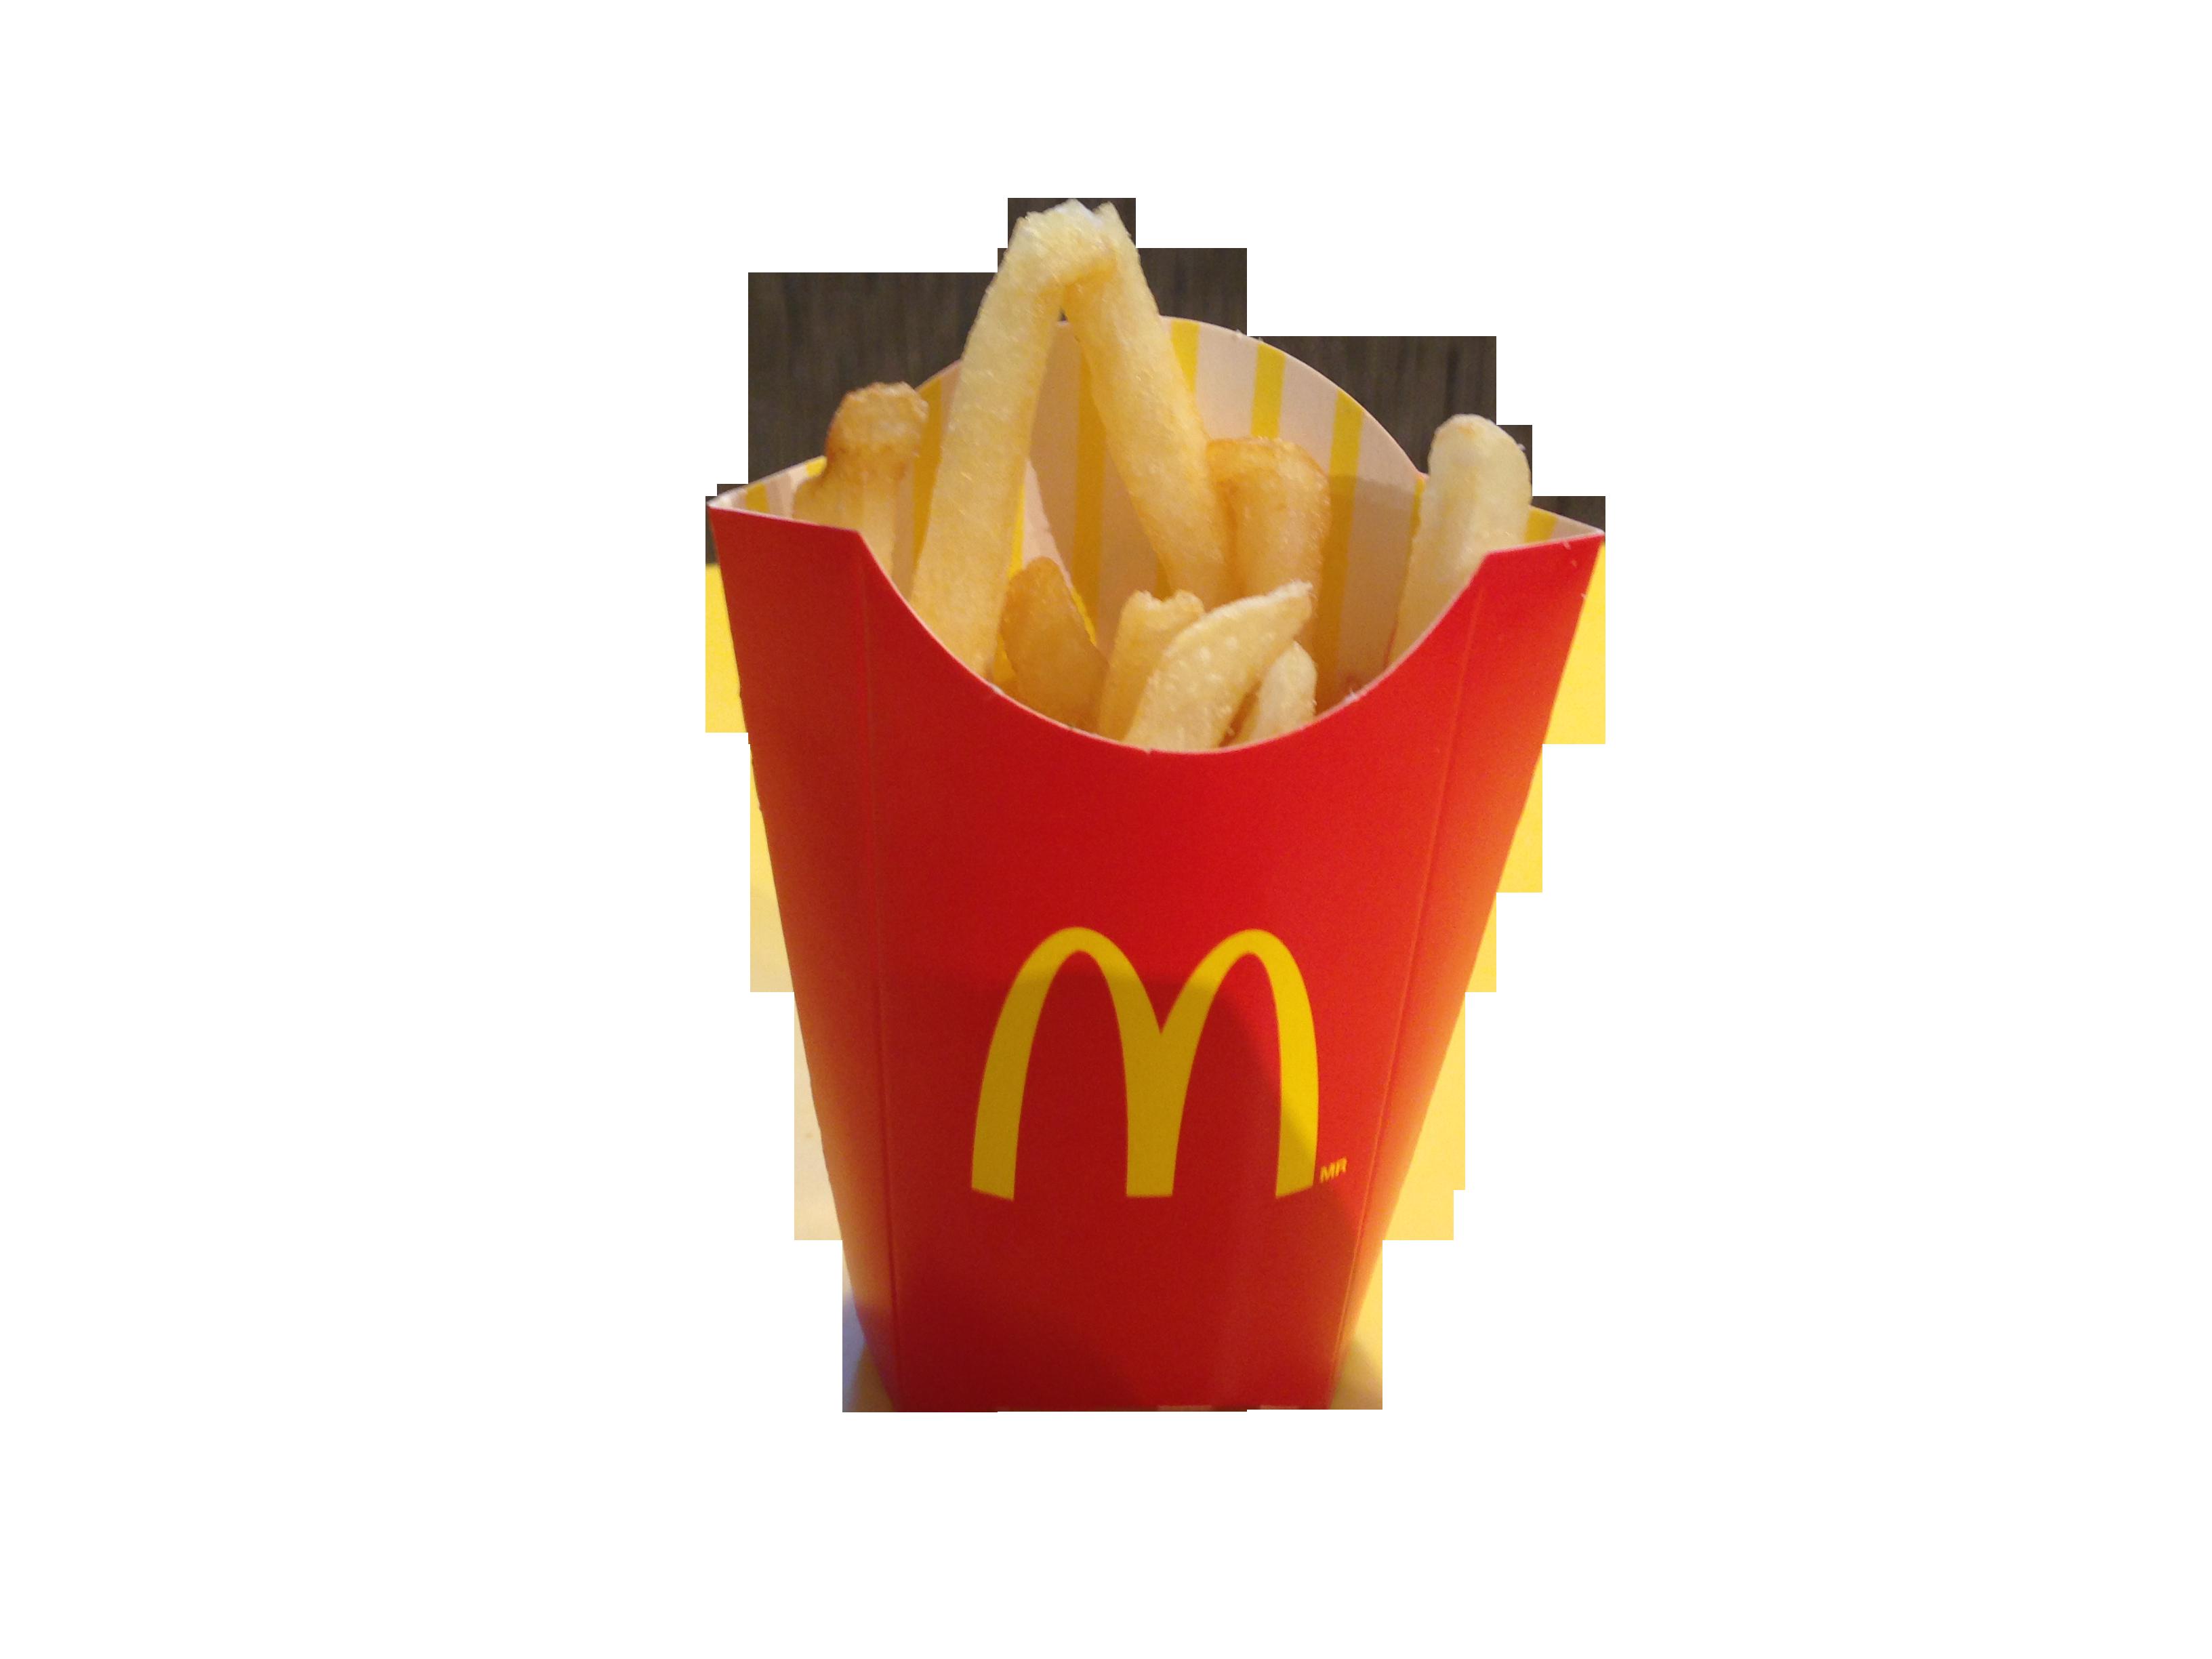 Resultado de imagen para. Fries clipart hat mcdonalds